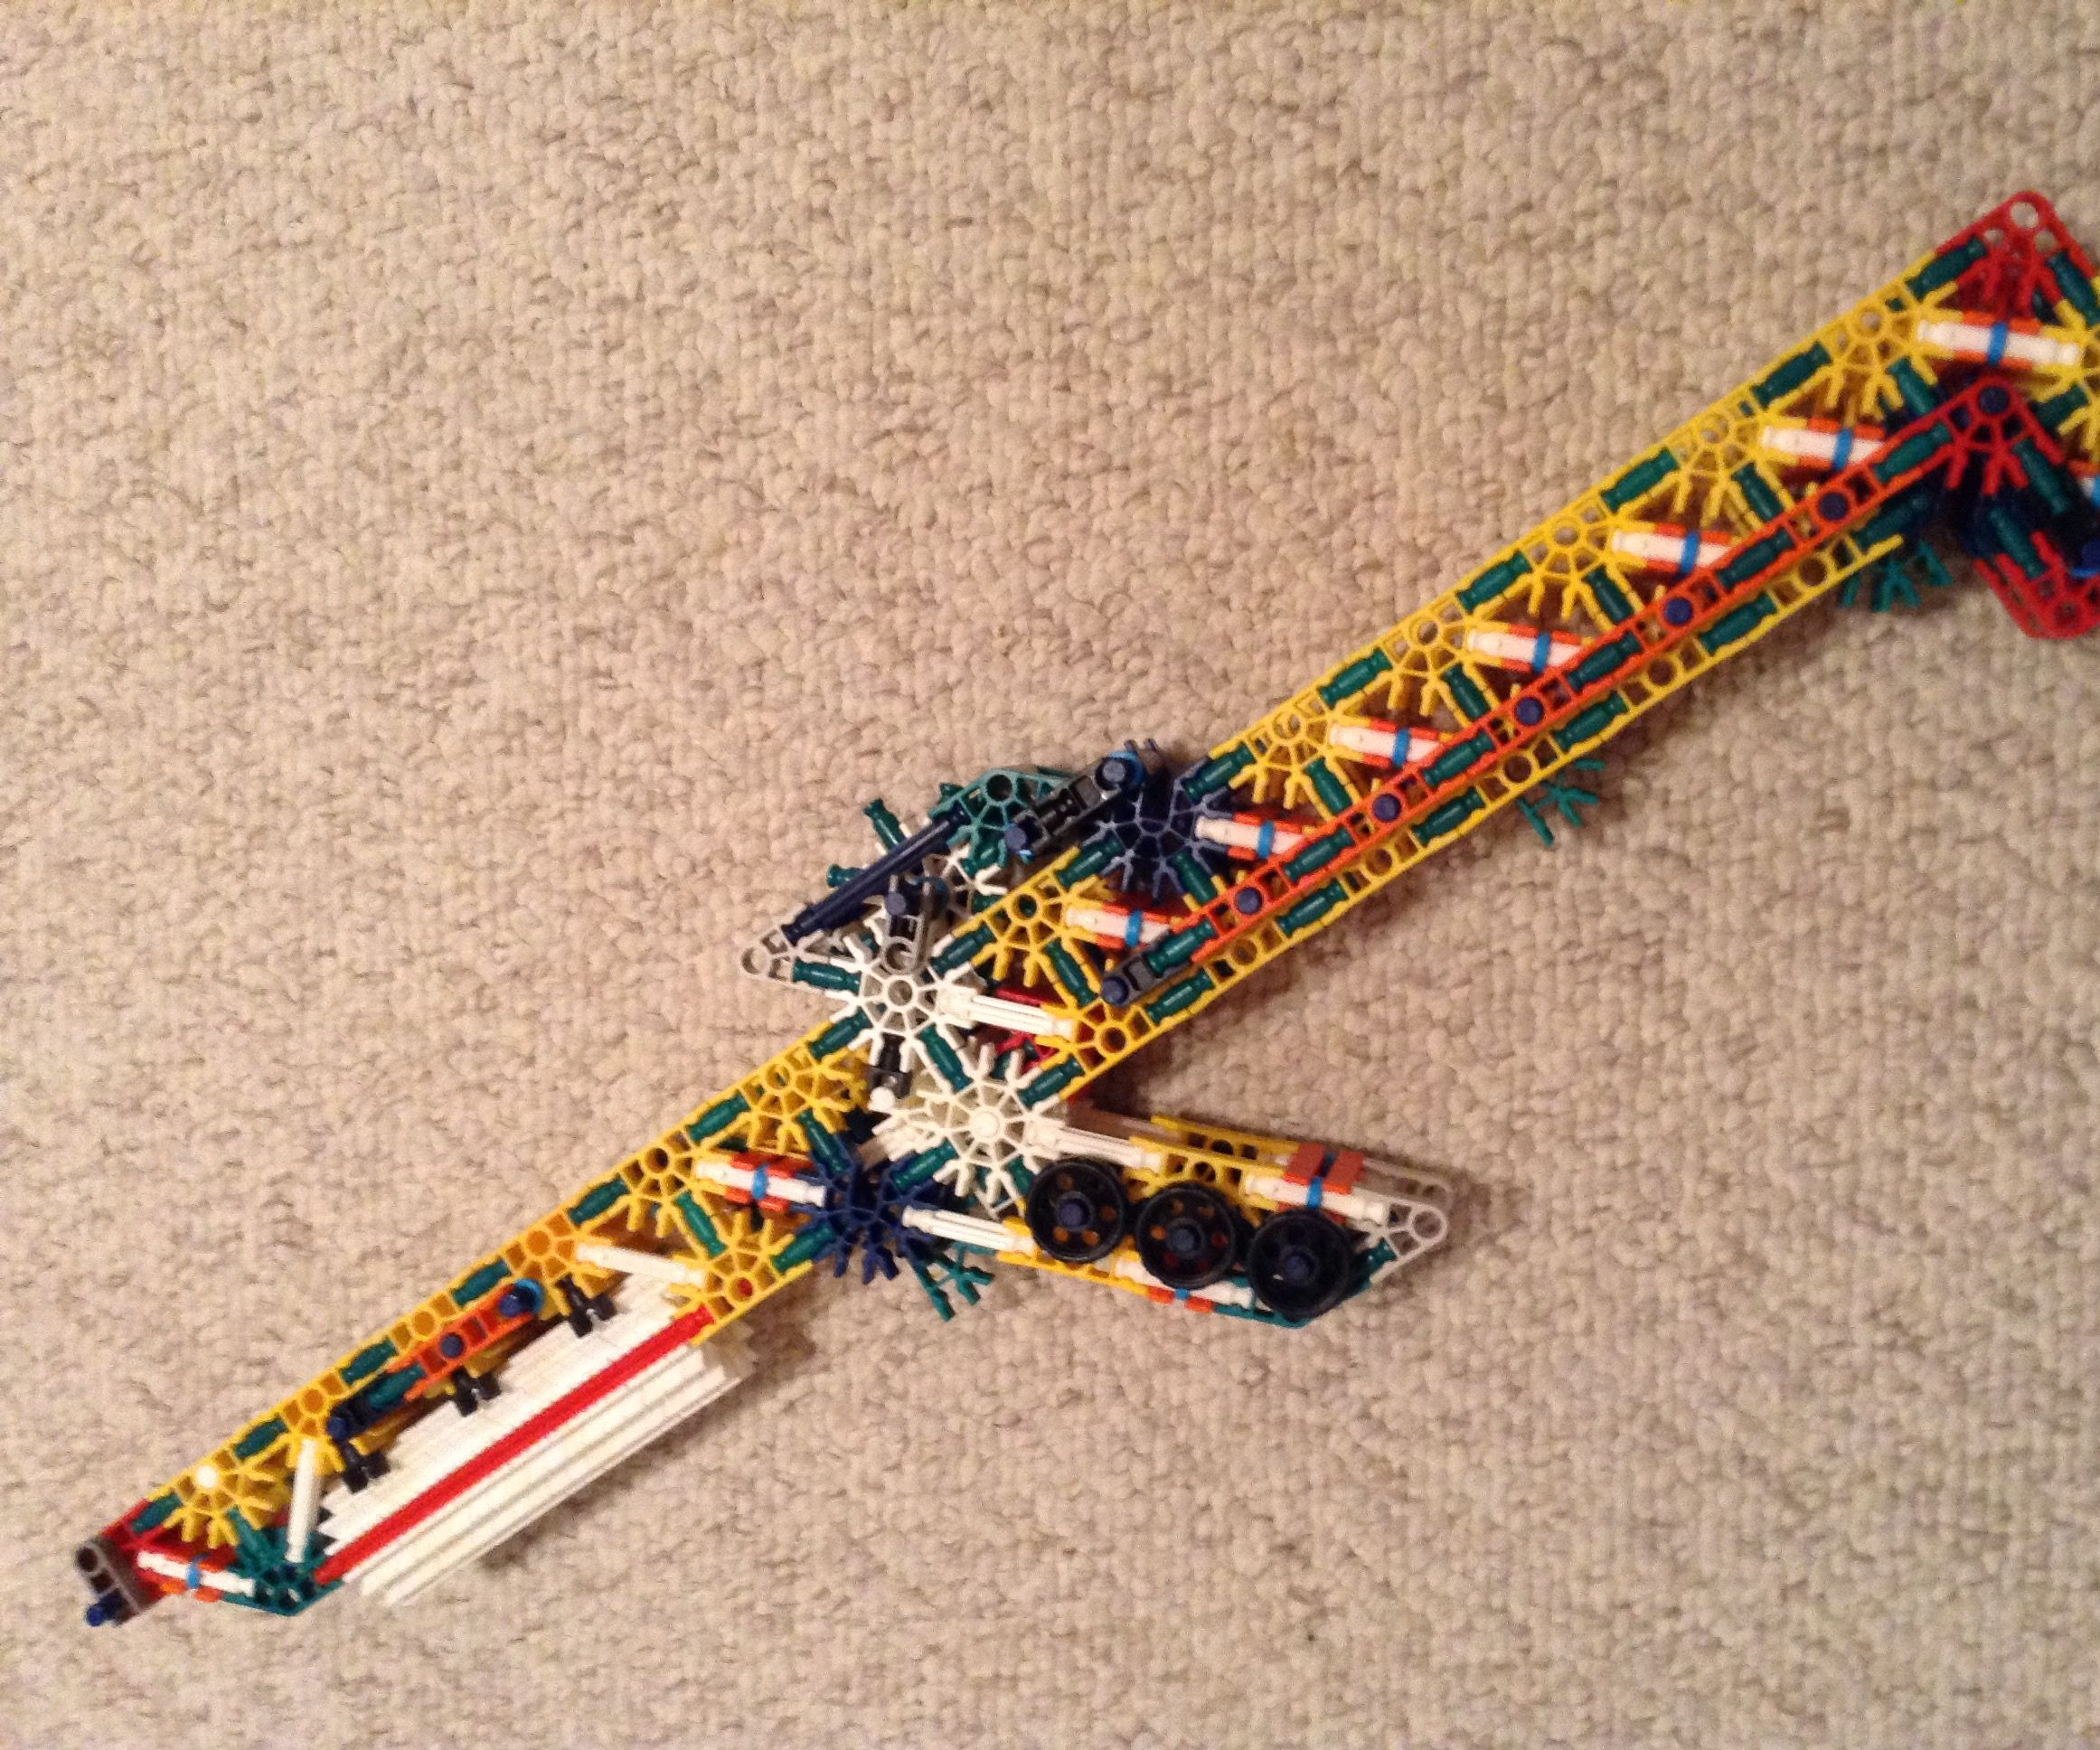 K'nex Rubber Band Gun